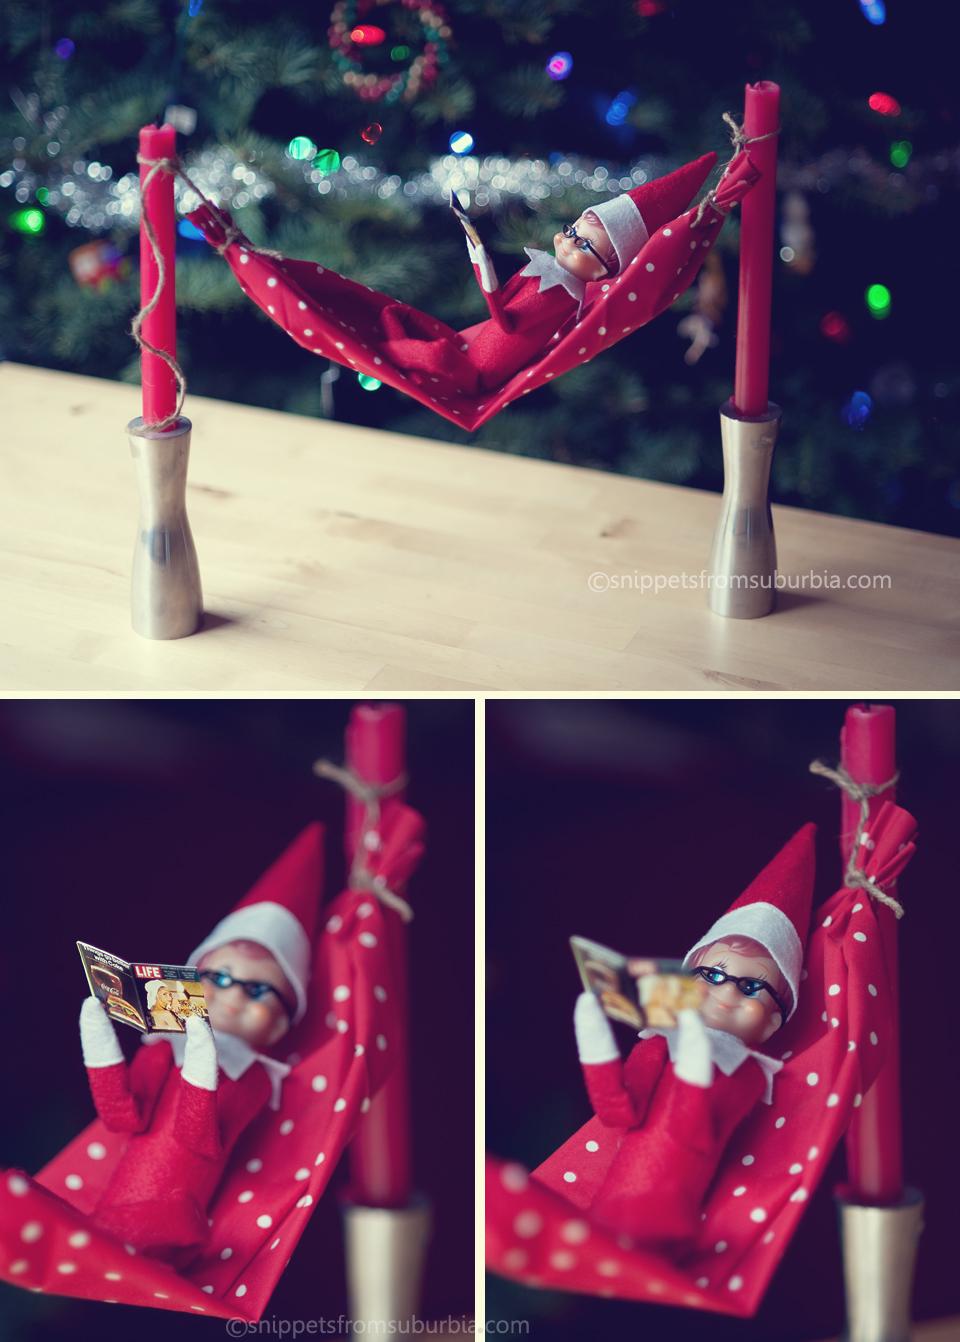 Elf on the Shelf, December 16th